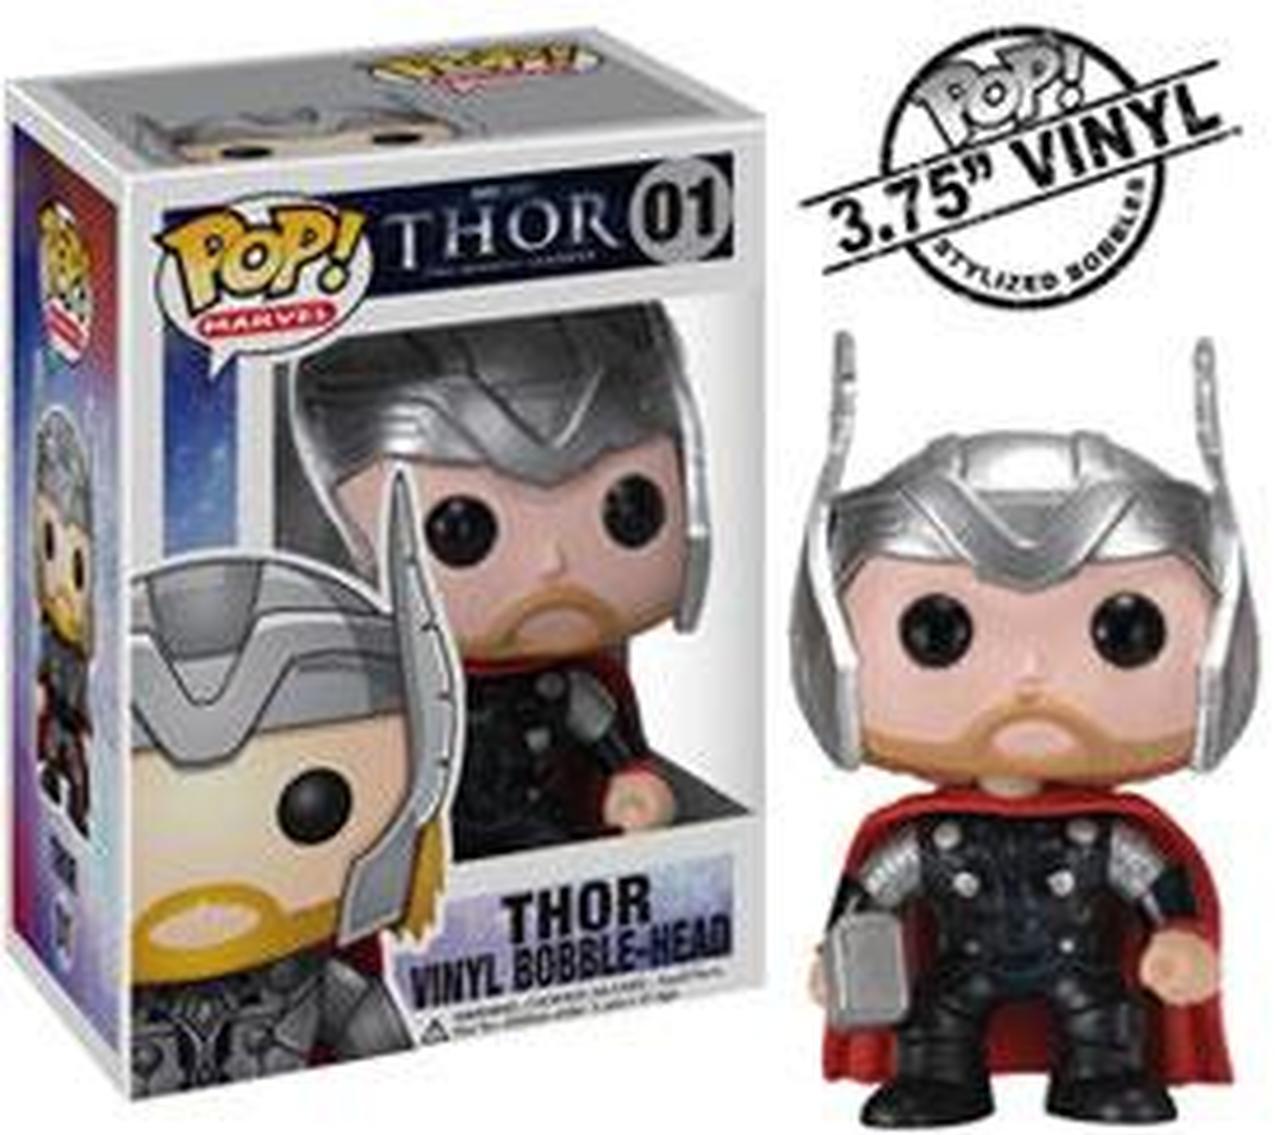 Funko Pop Thor 01